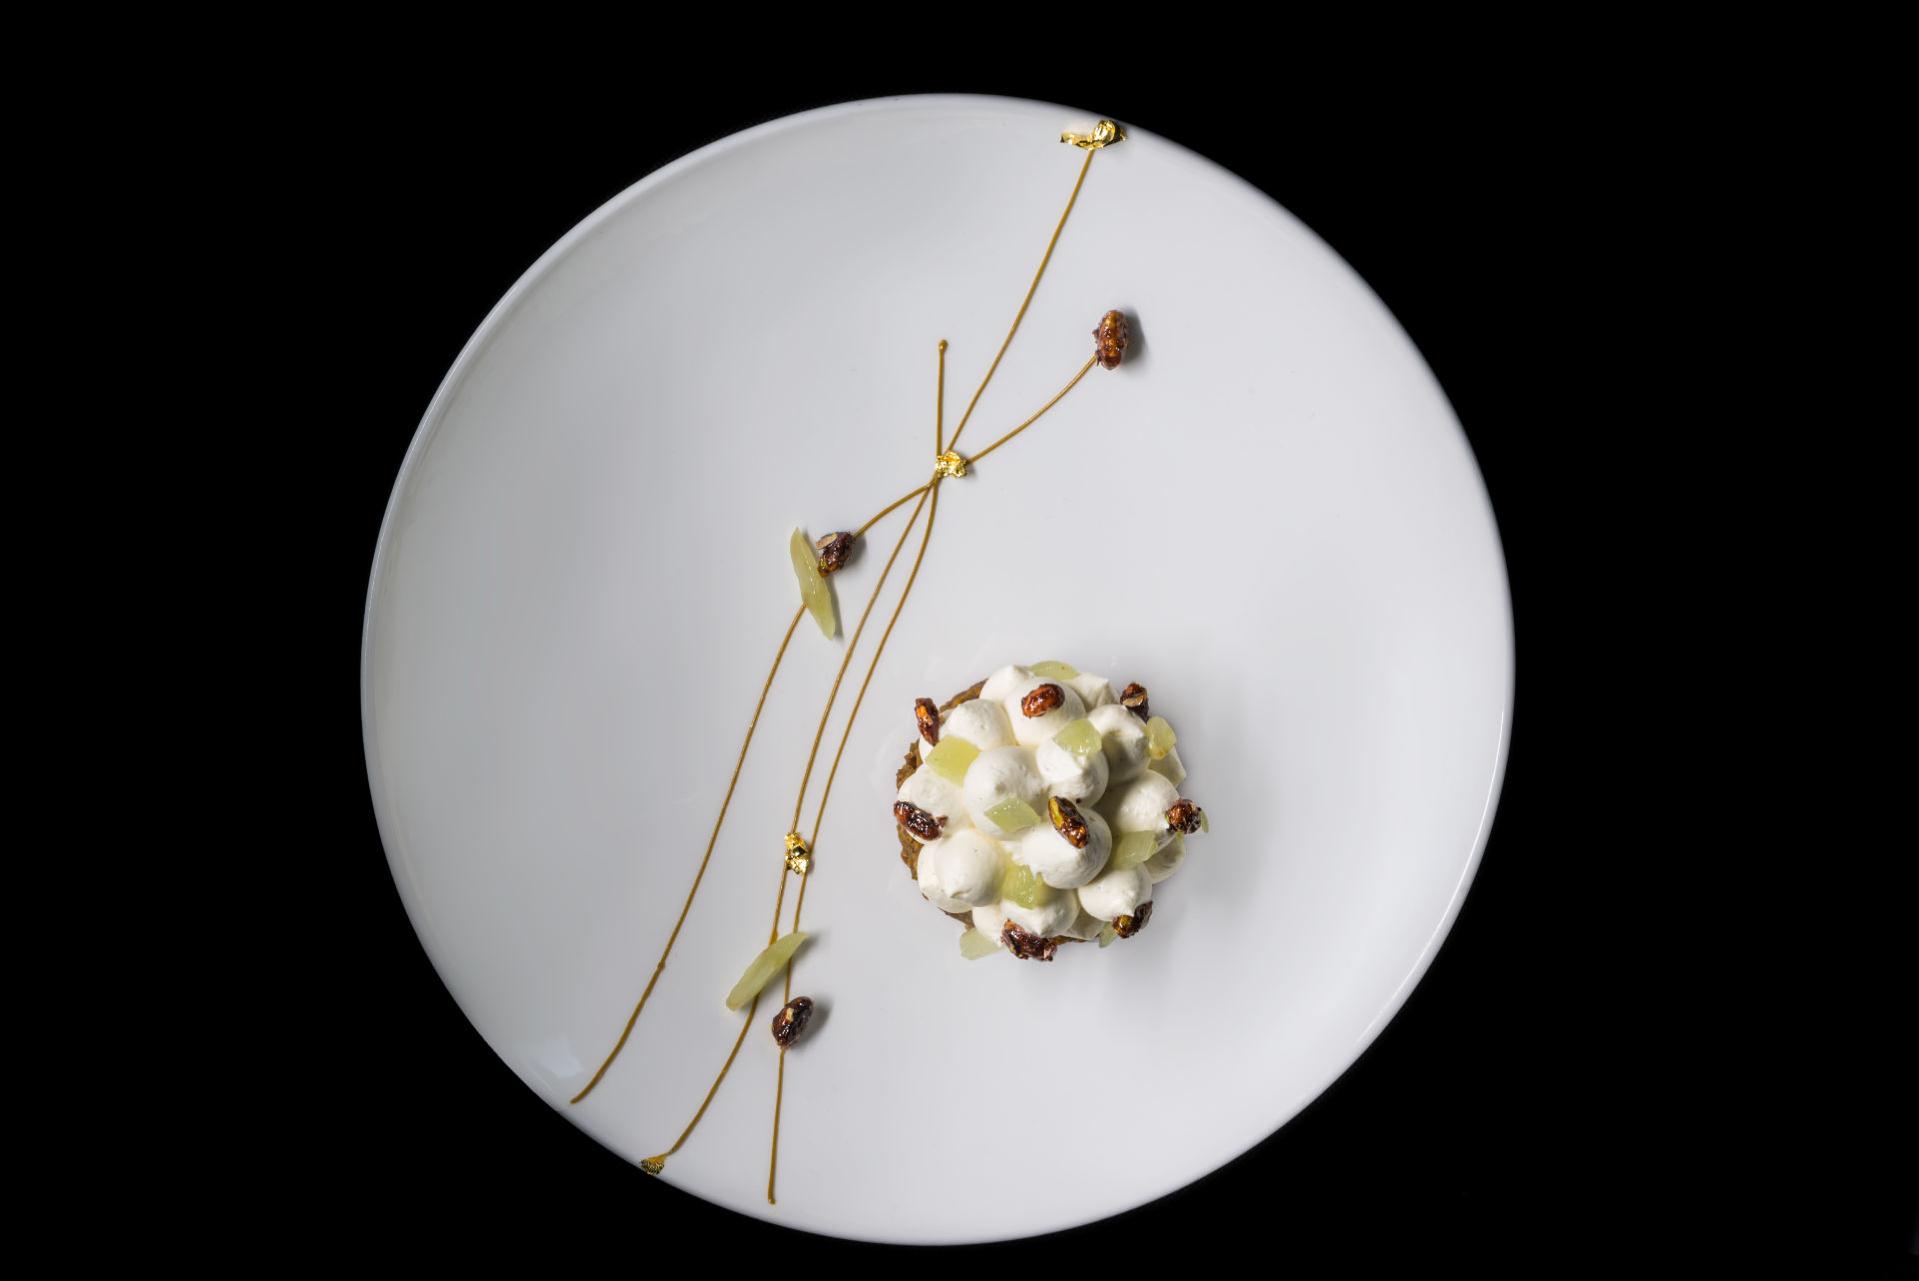 Alali_Restaurant_-_Fine_Dining_Experience_in_Santorini_11.jpg